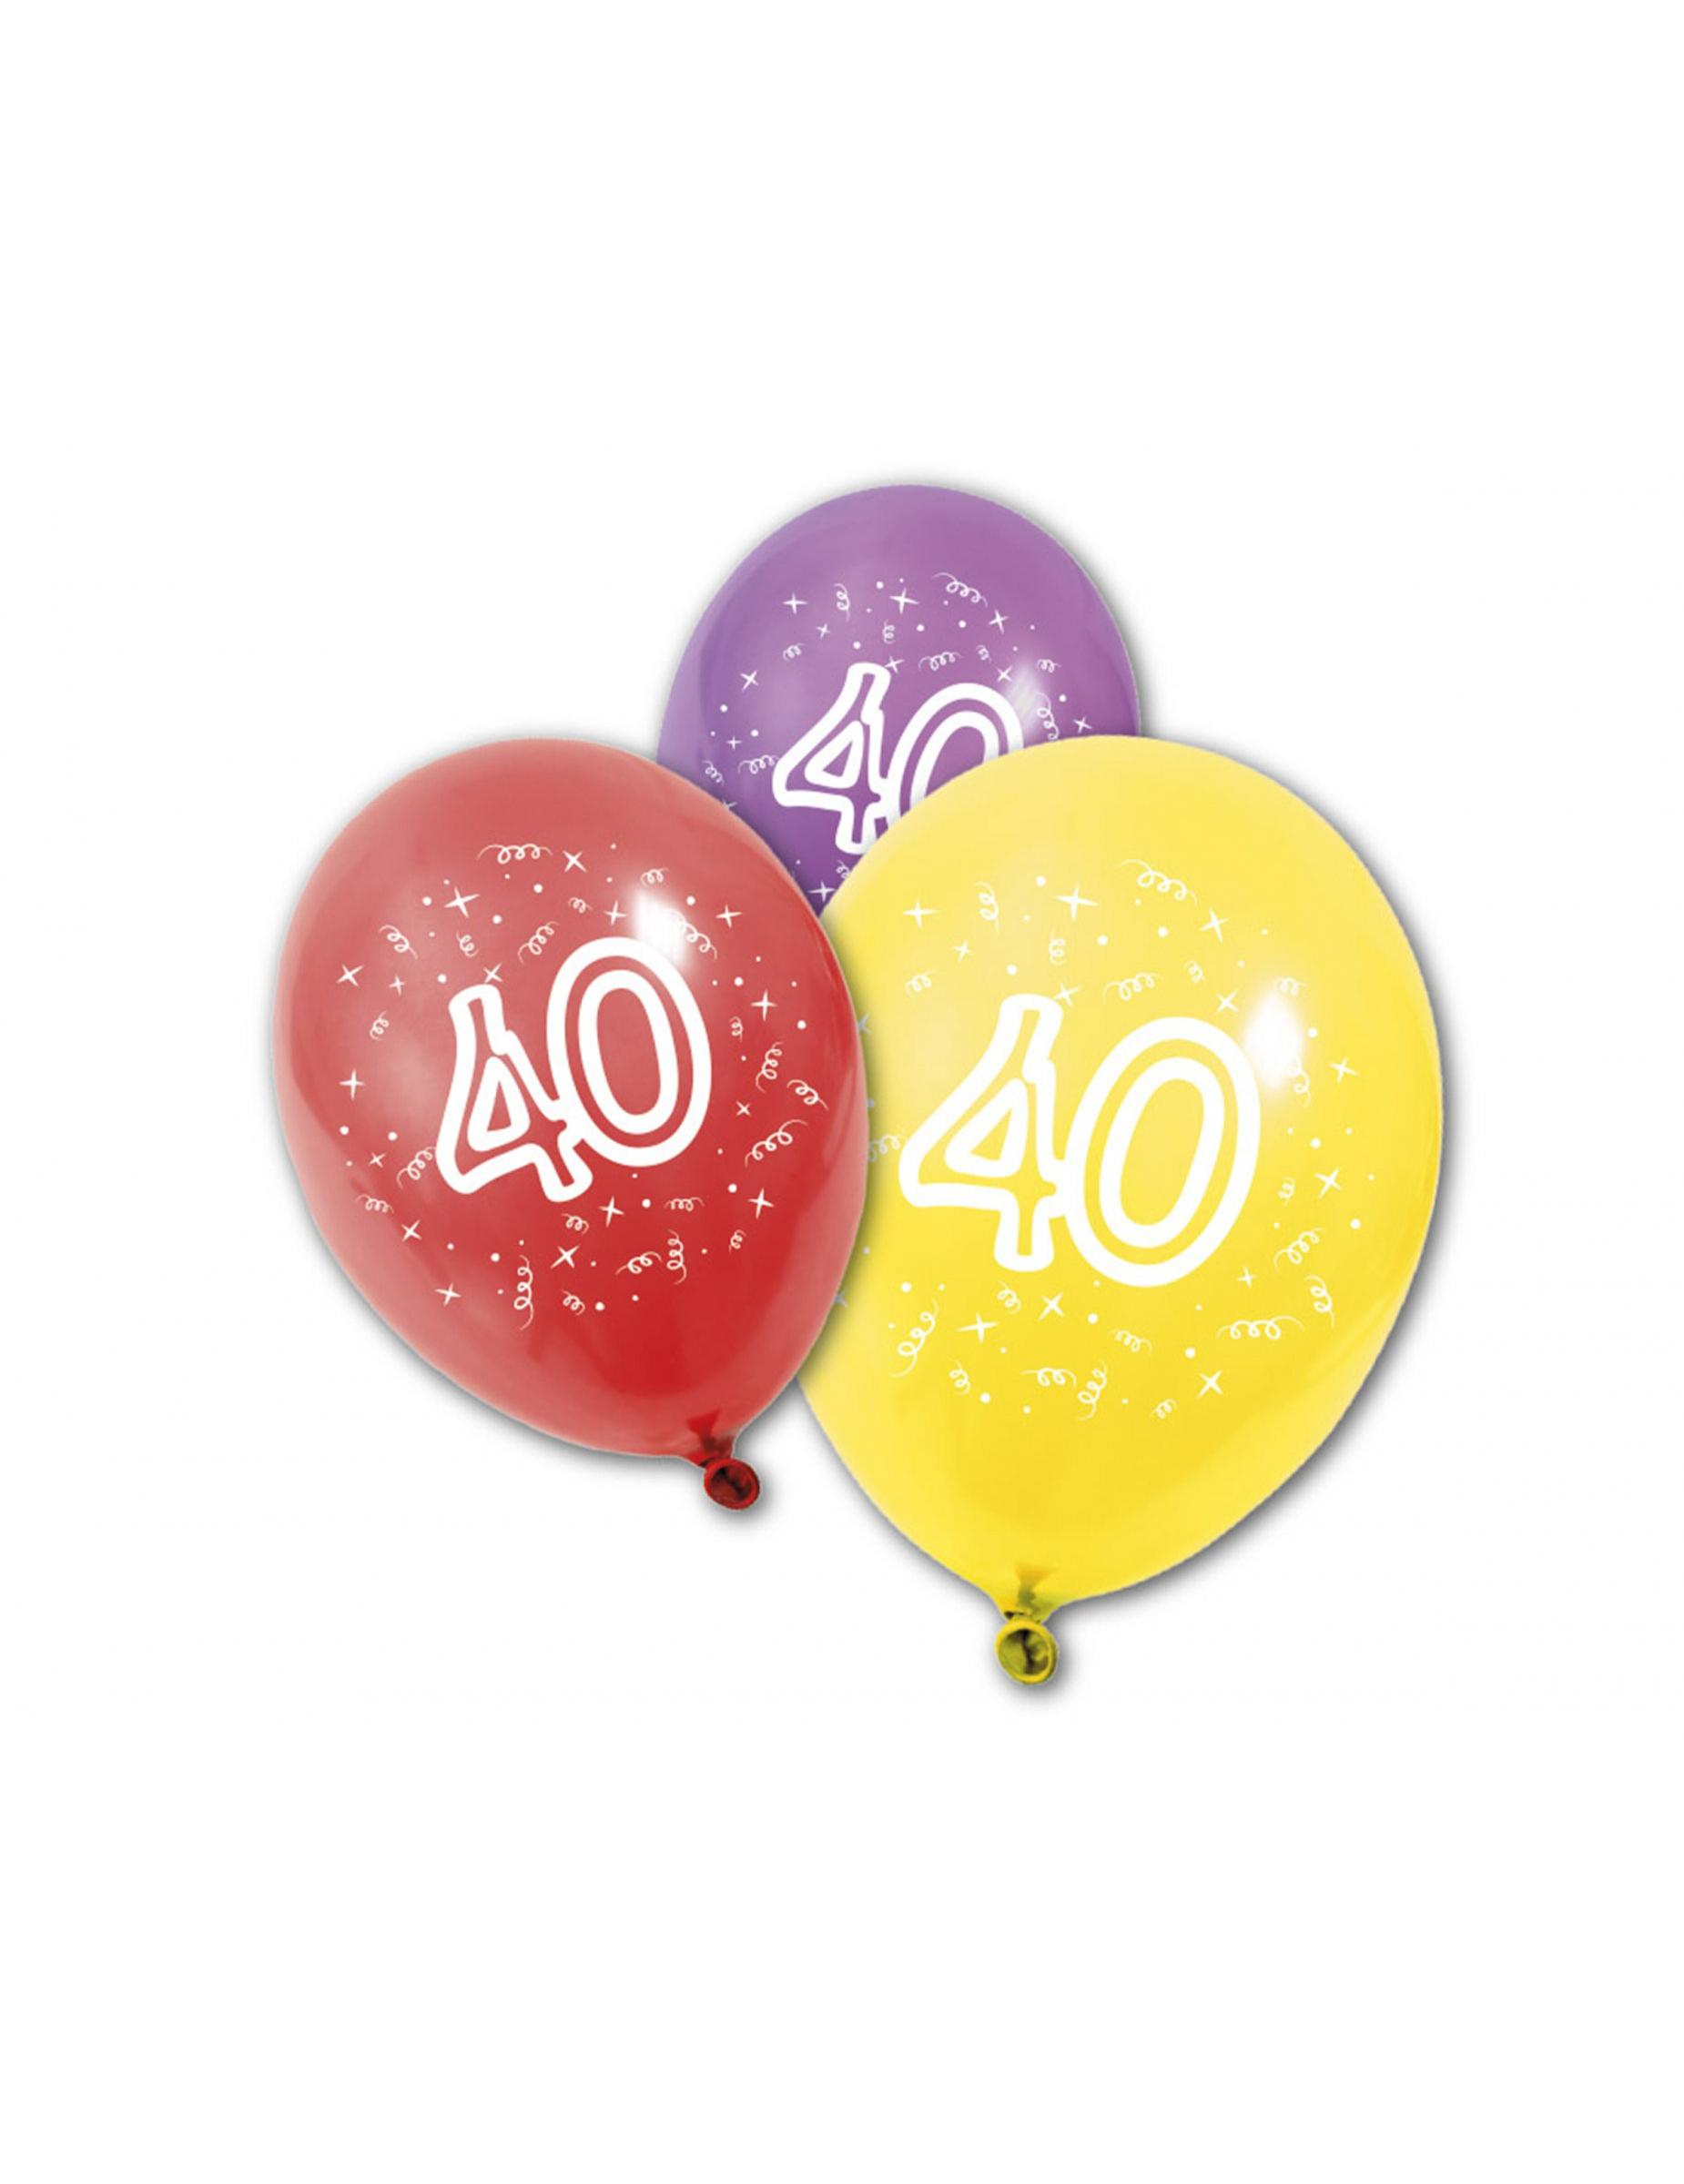 8 globos de cumplea os 40 a os decoraci n y disfraces - Globos 50 anos ...